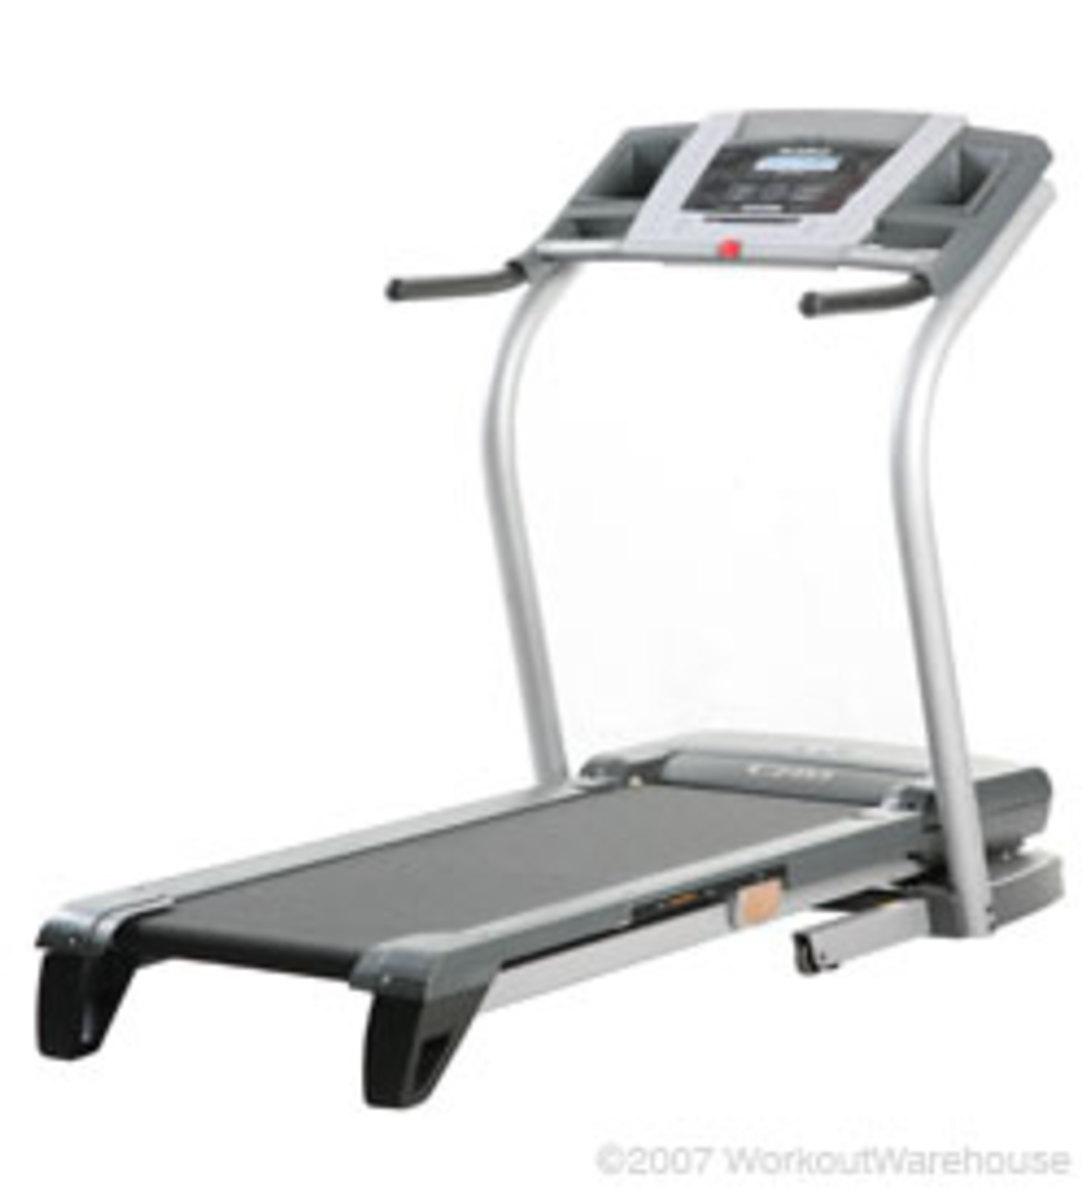 NordicTrack C2155 Treadmill